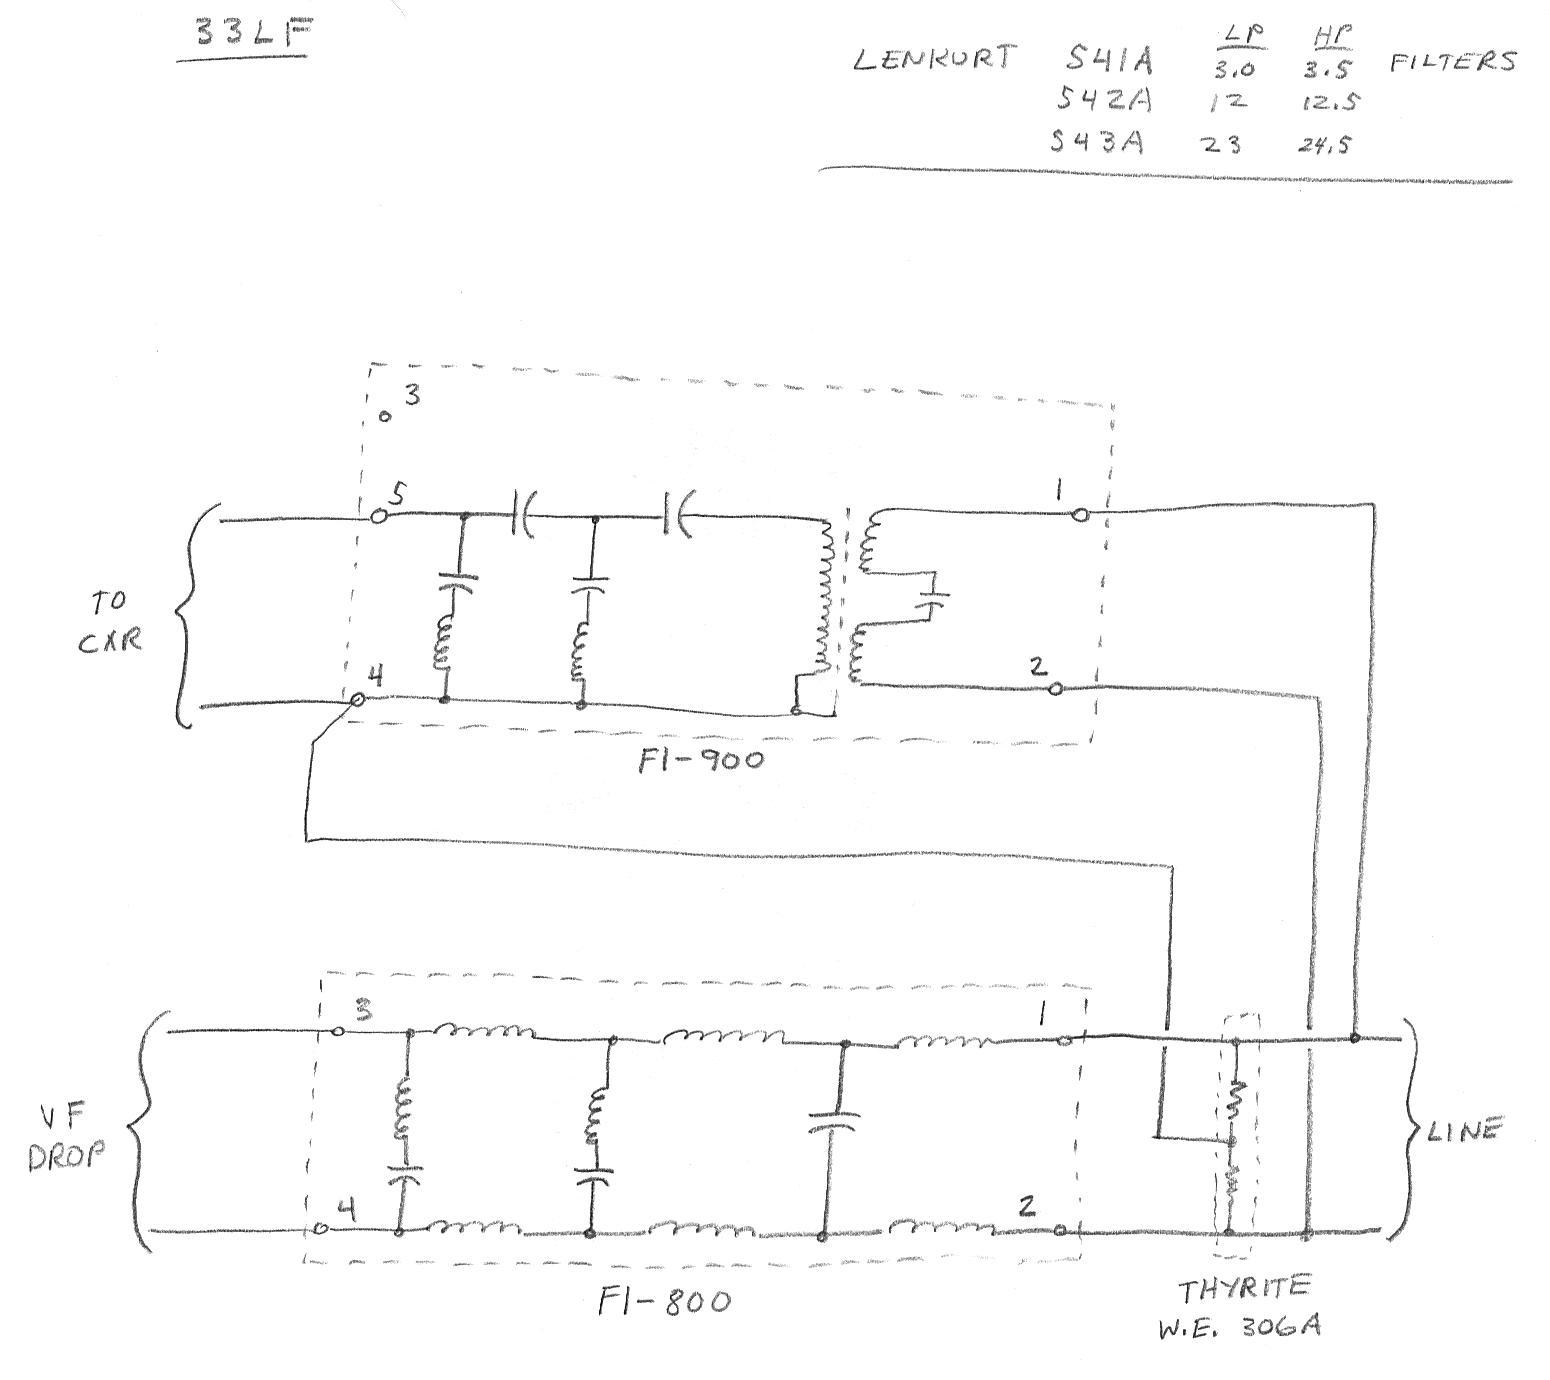 lenkurt_54x_filters telephone technical references weko wiring diagram at readyjetset.co